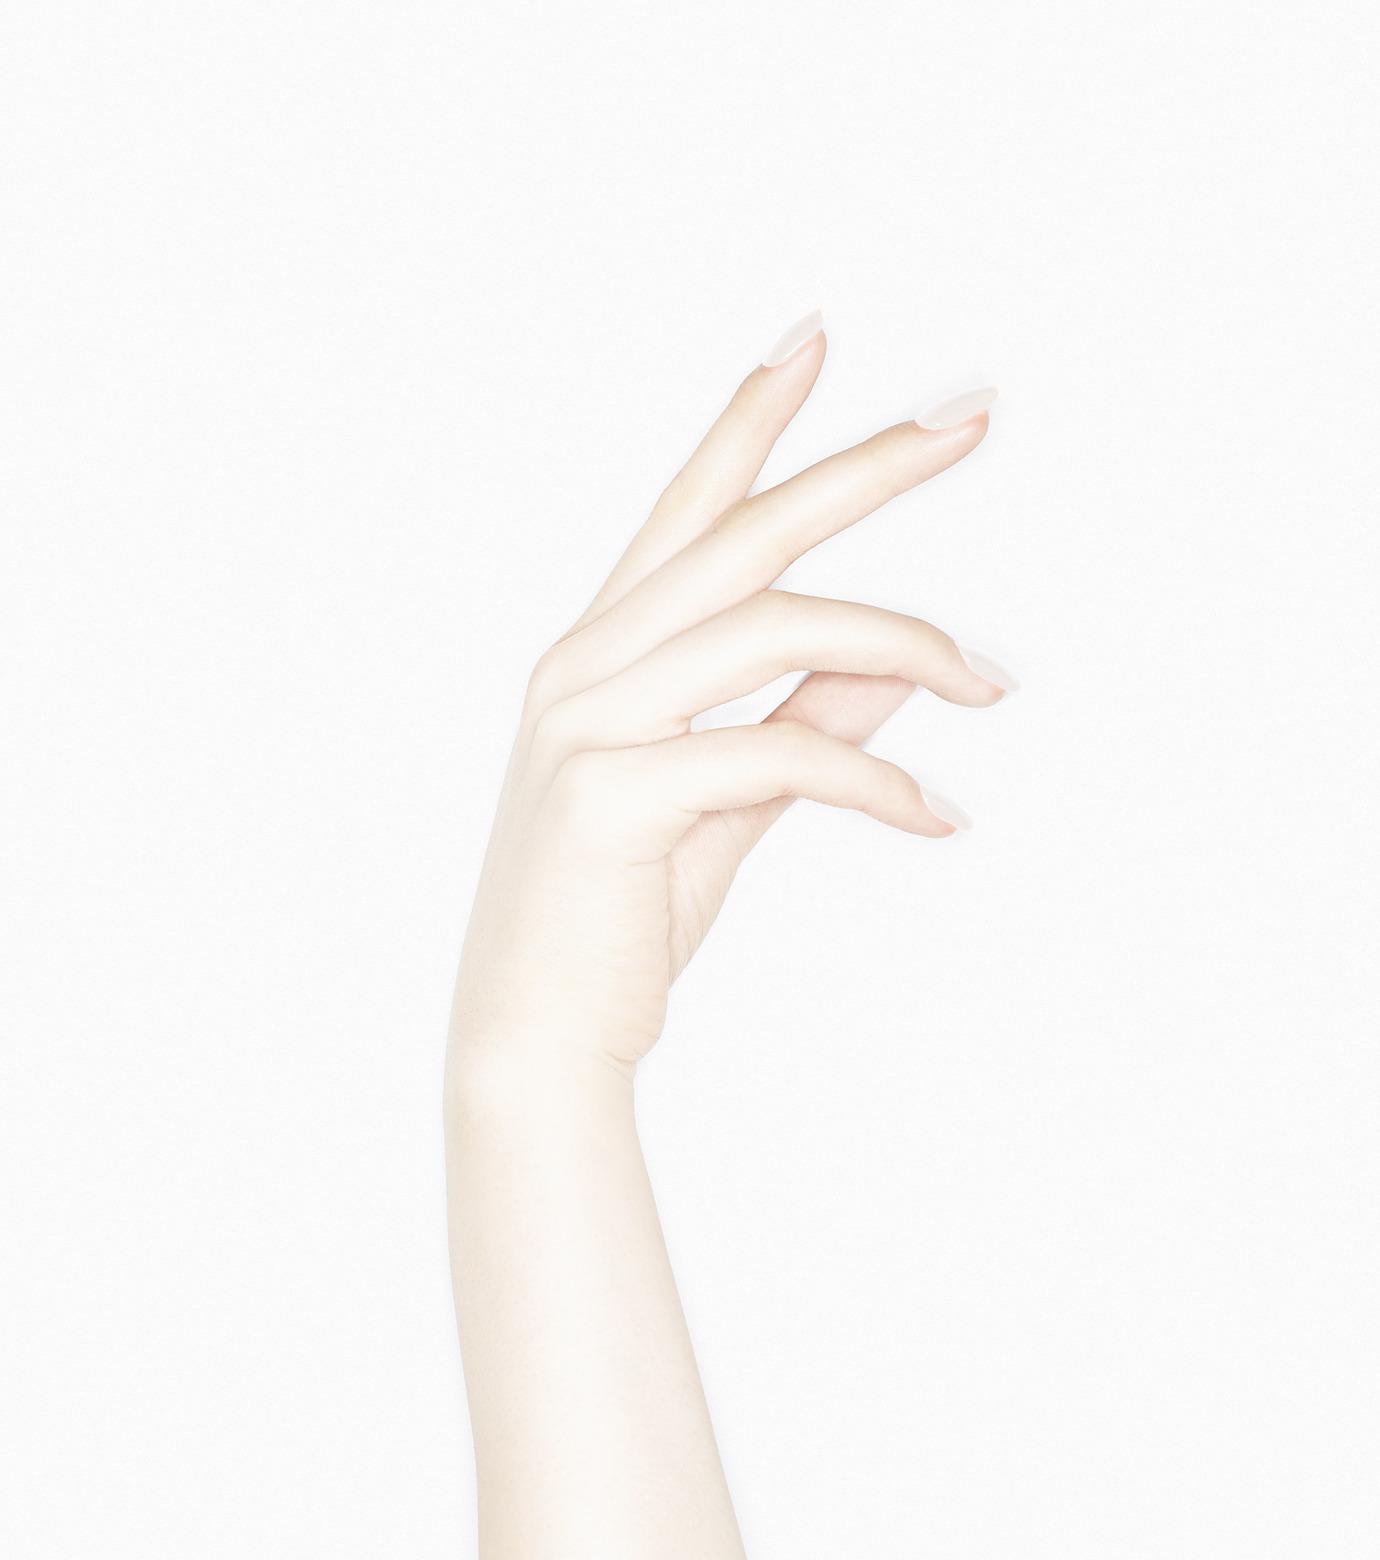 GRANJE(グランジェ)のSnow White-WHITE(MAKE-UP/MAKE-UP)-61-4 拡大詳細画像2